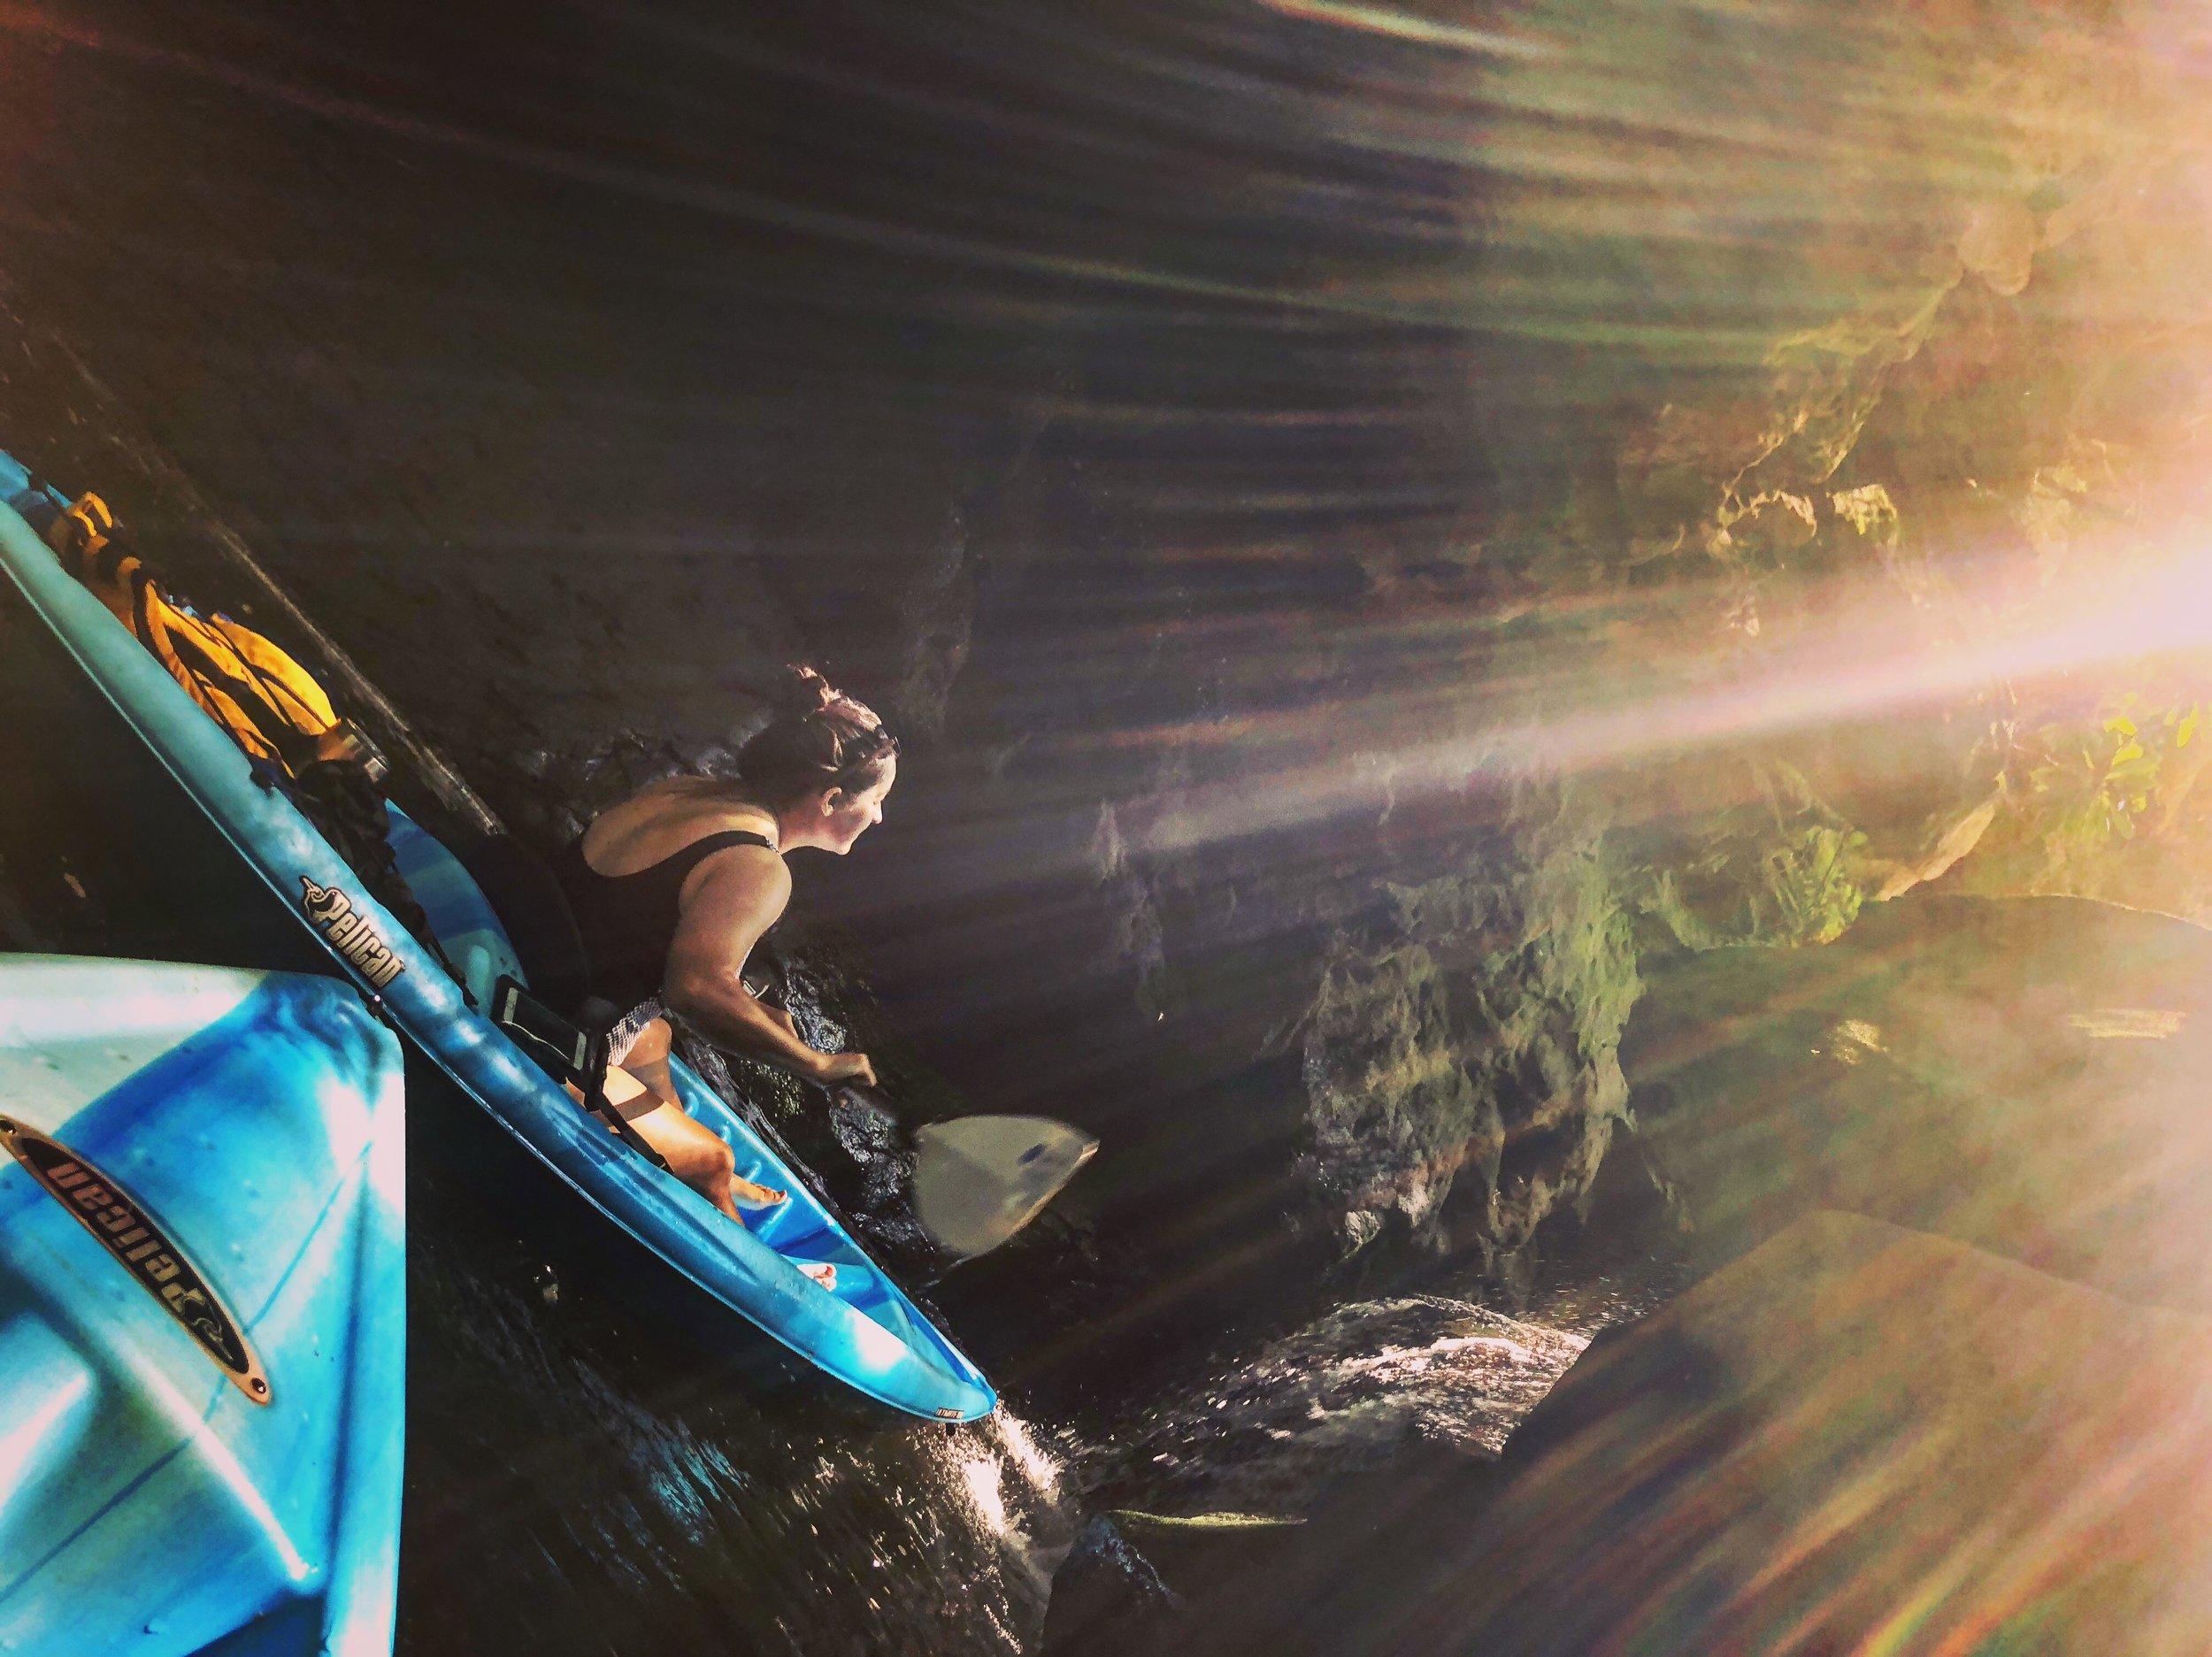 Chasing Waterfalls on a Guided Kayaking Trip to Grayson Lake.